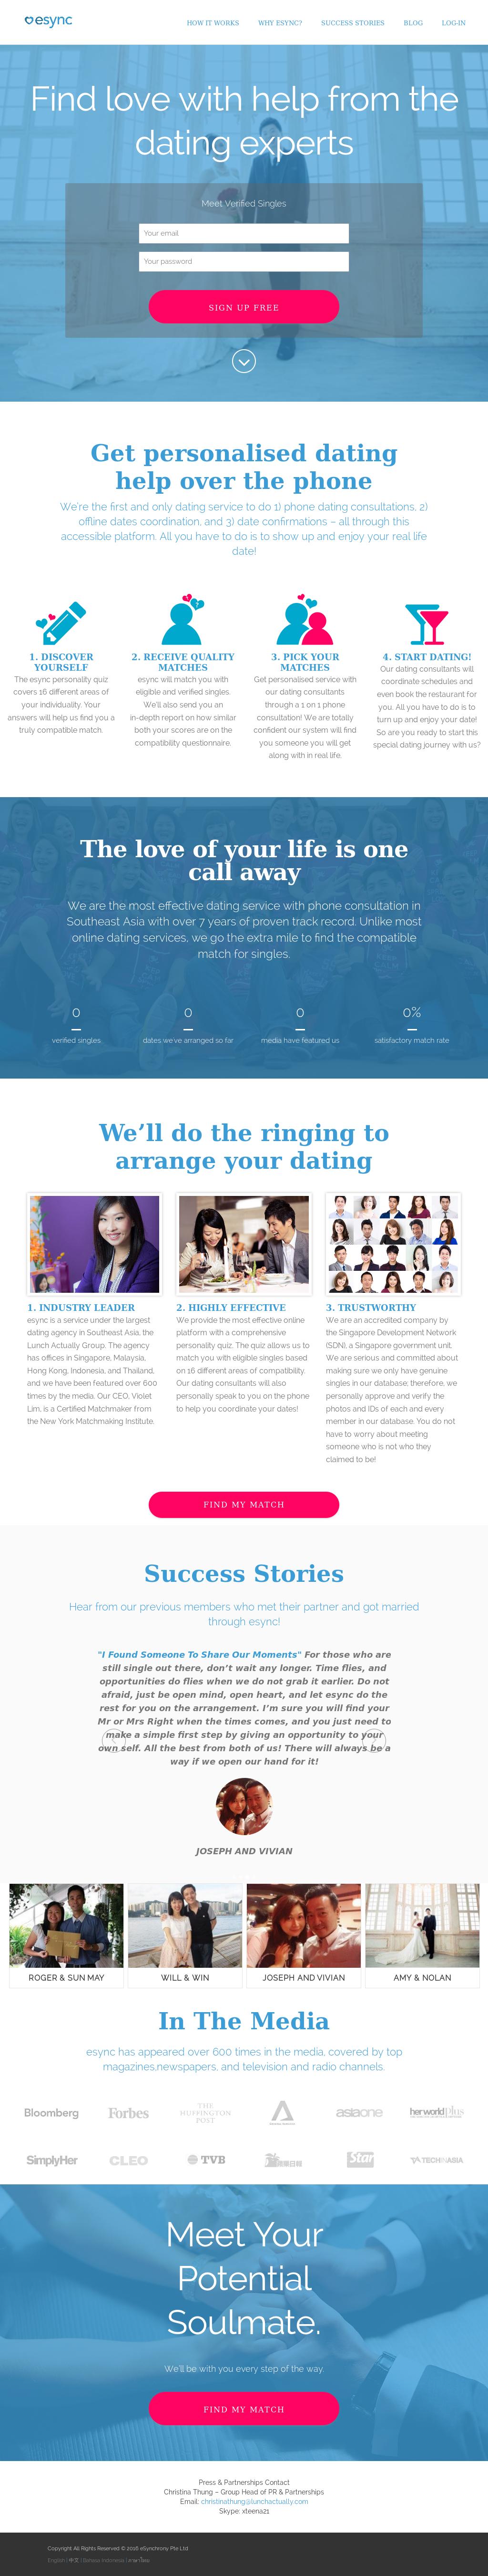 Asian dating agency malaysia